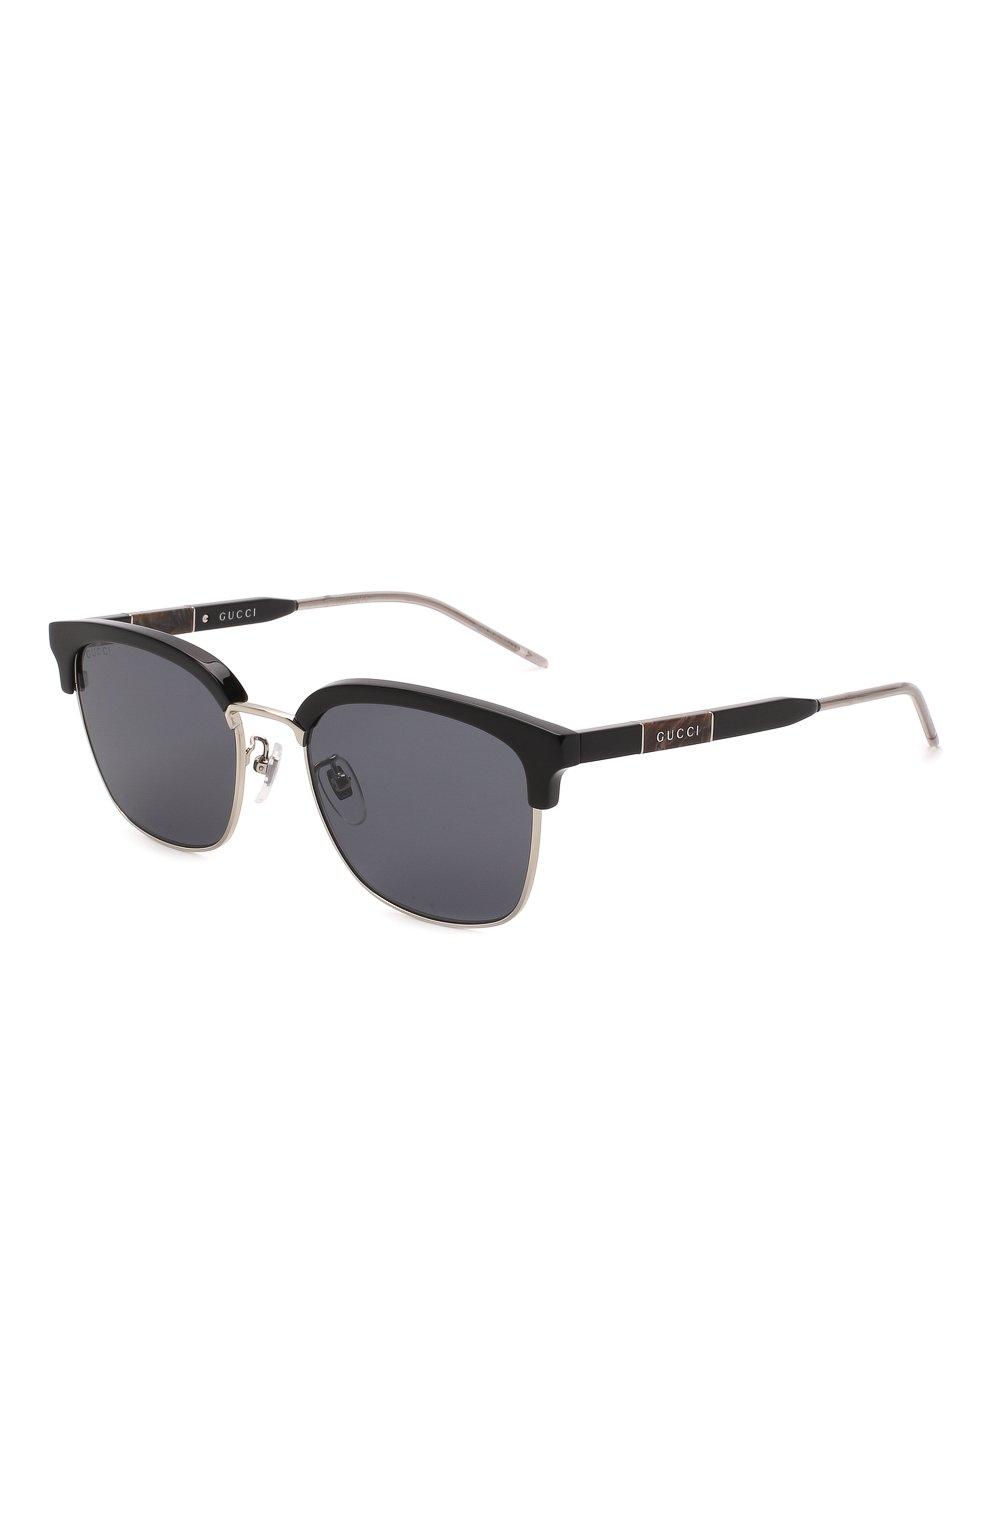 Мужские солнцезащитные очки GUCCI черного цвета, арт. GG0846SK 001 | Фото 1